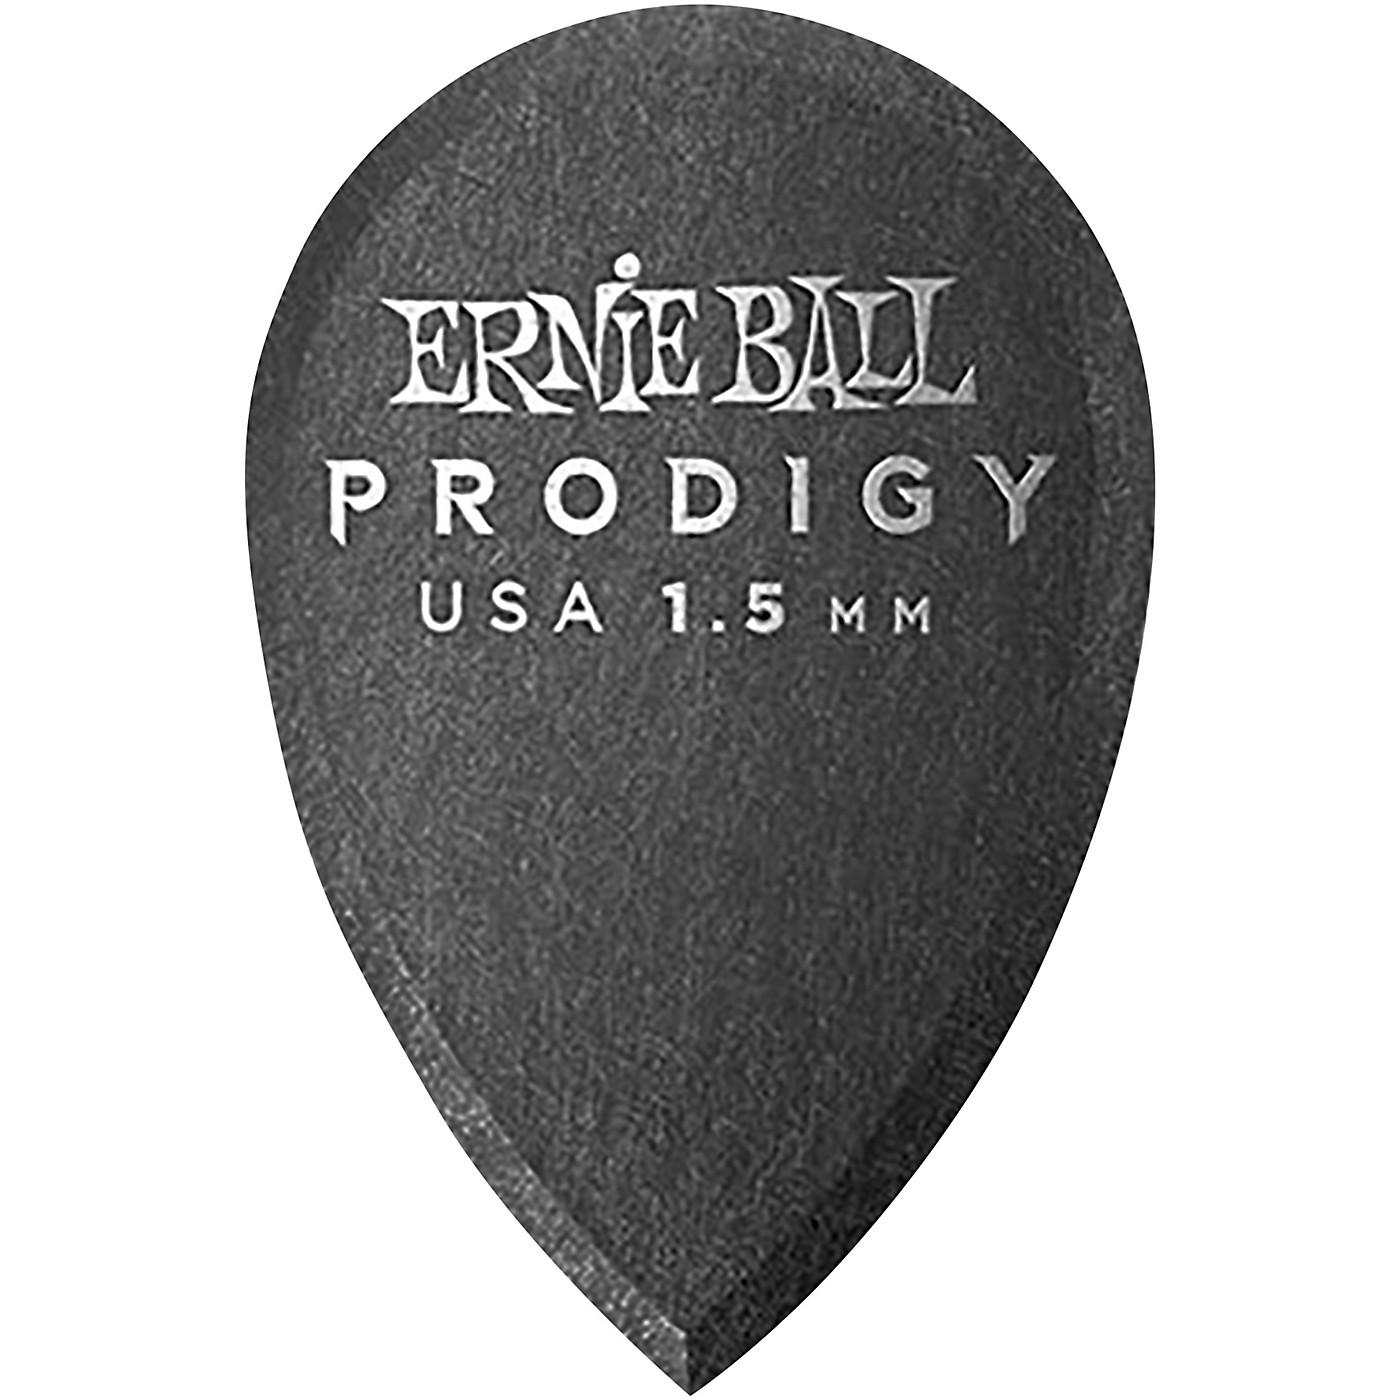 Ernie Ball Teardrop Prodigy Picks 6-Pack thumbnail